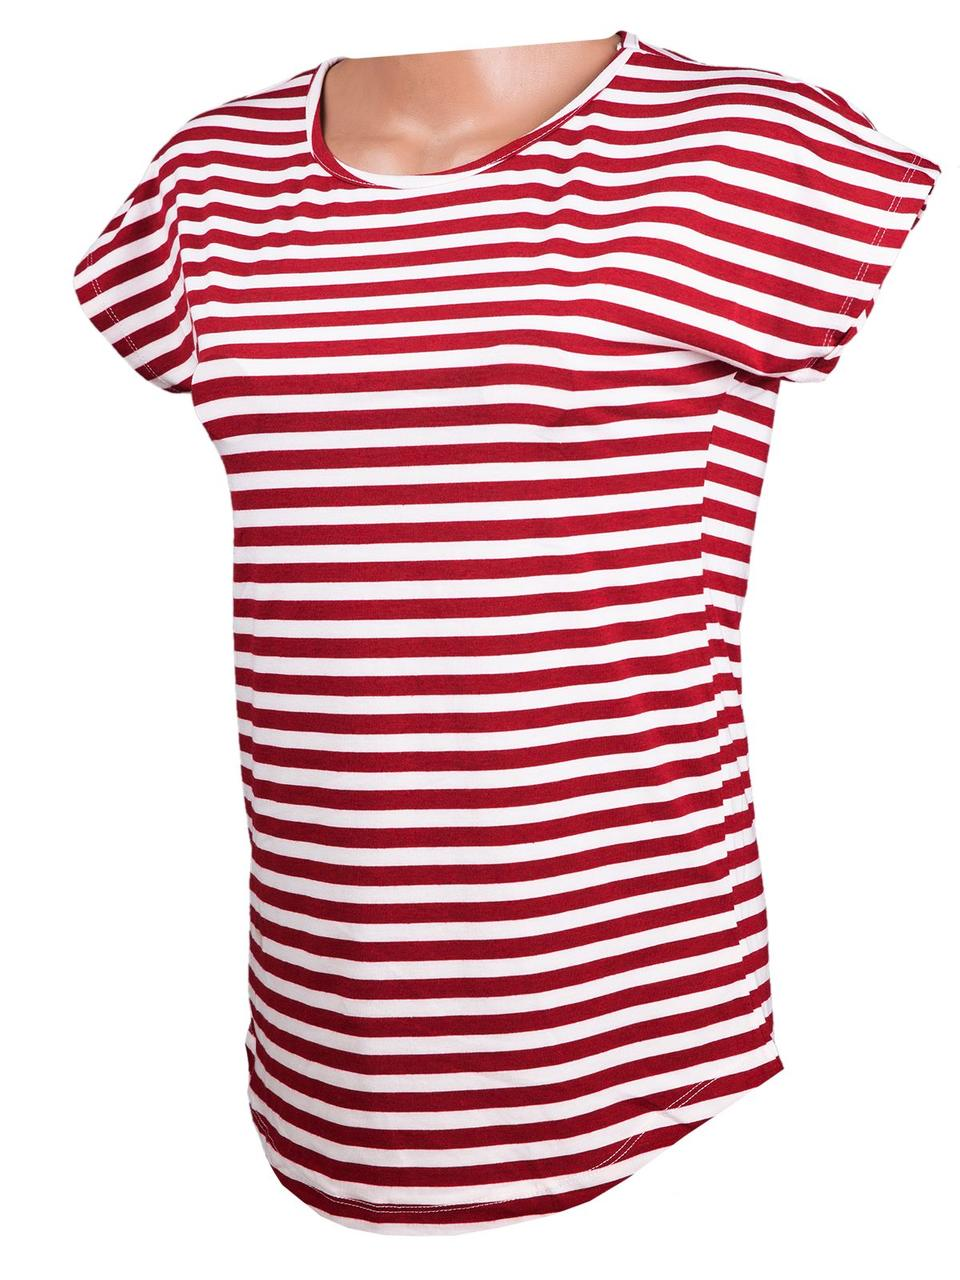 Женская летняя футболка Батал